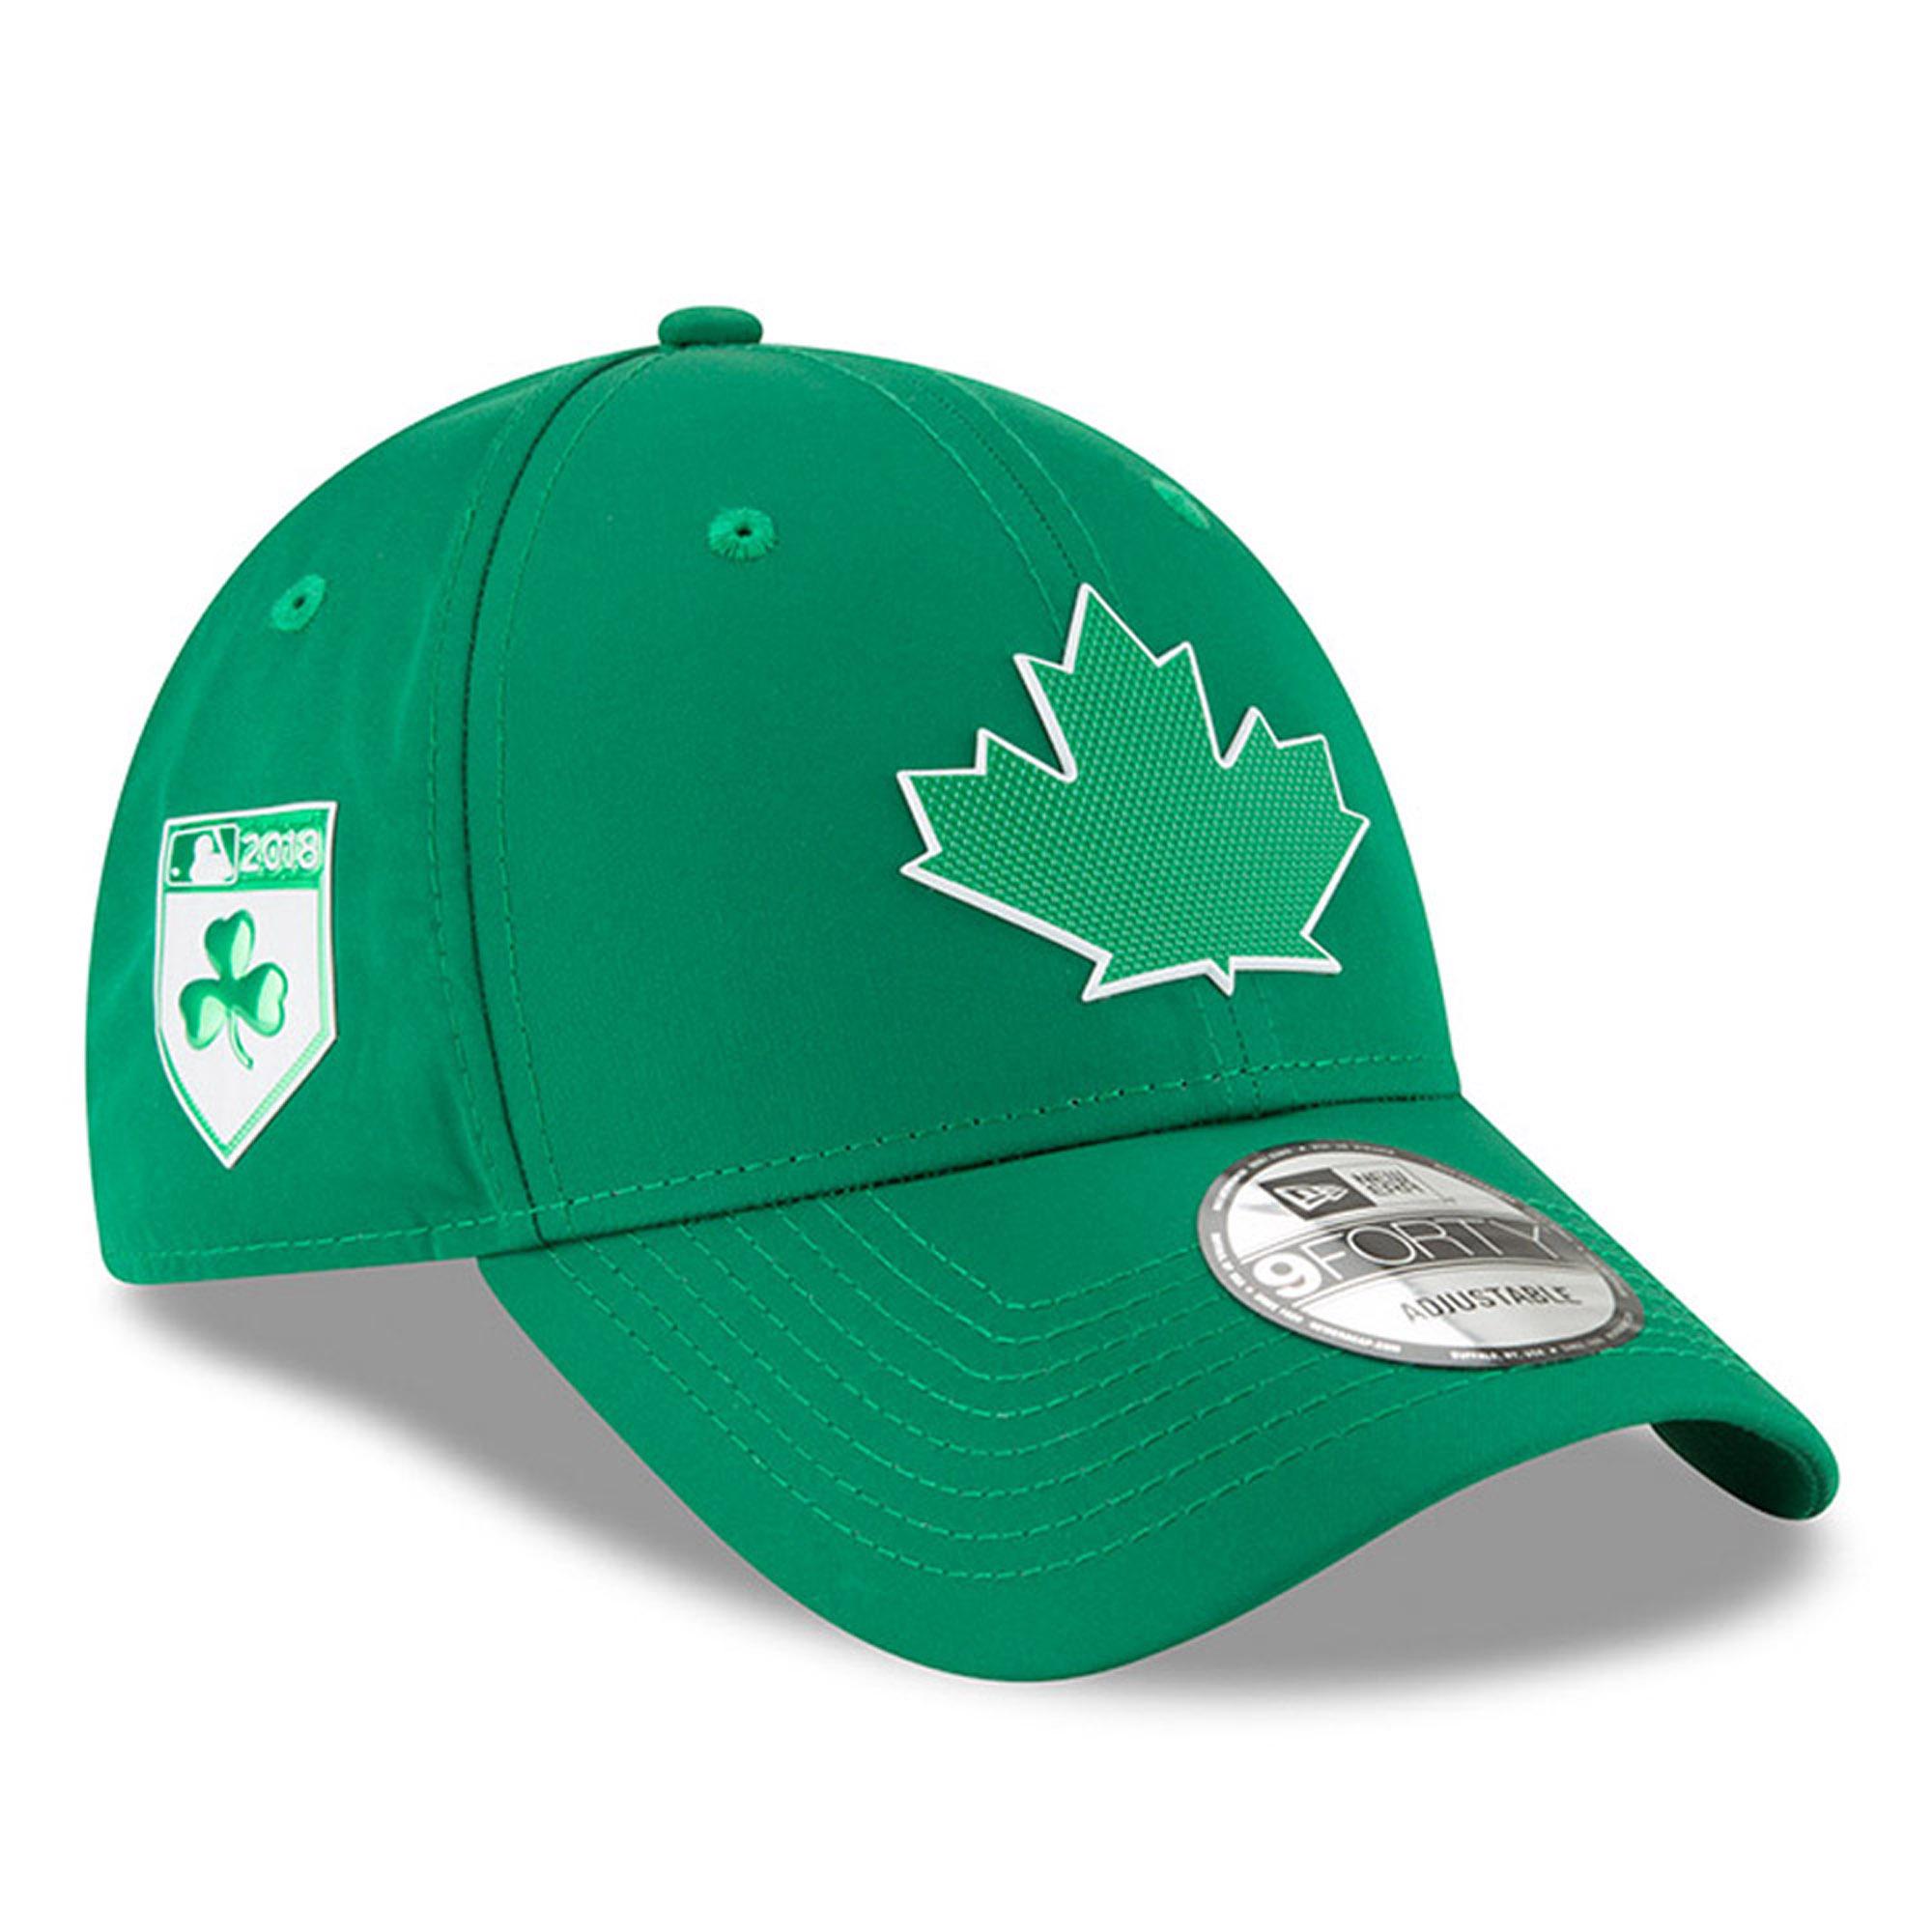 Toronto Blue Jays New Era 2018 St. Patrick's Day Prolight 9FORTY Adjustable Hat - Green - OSFA